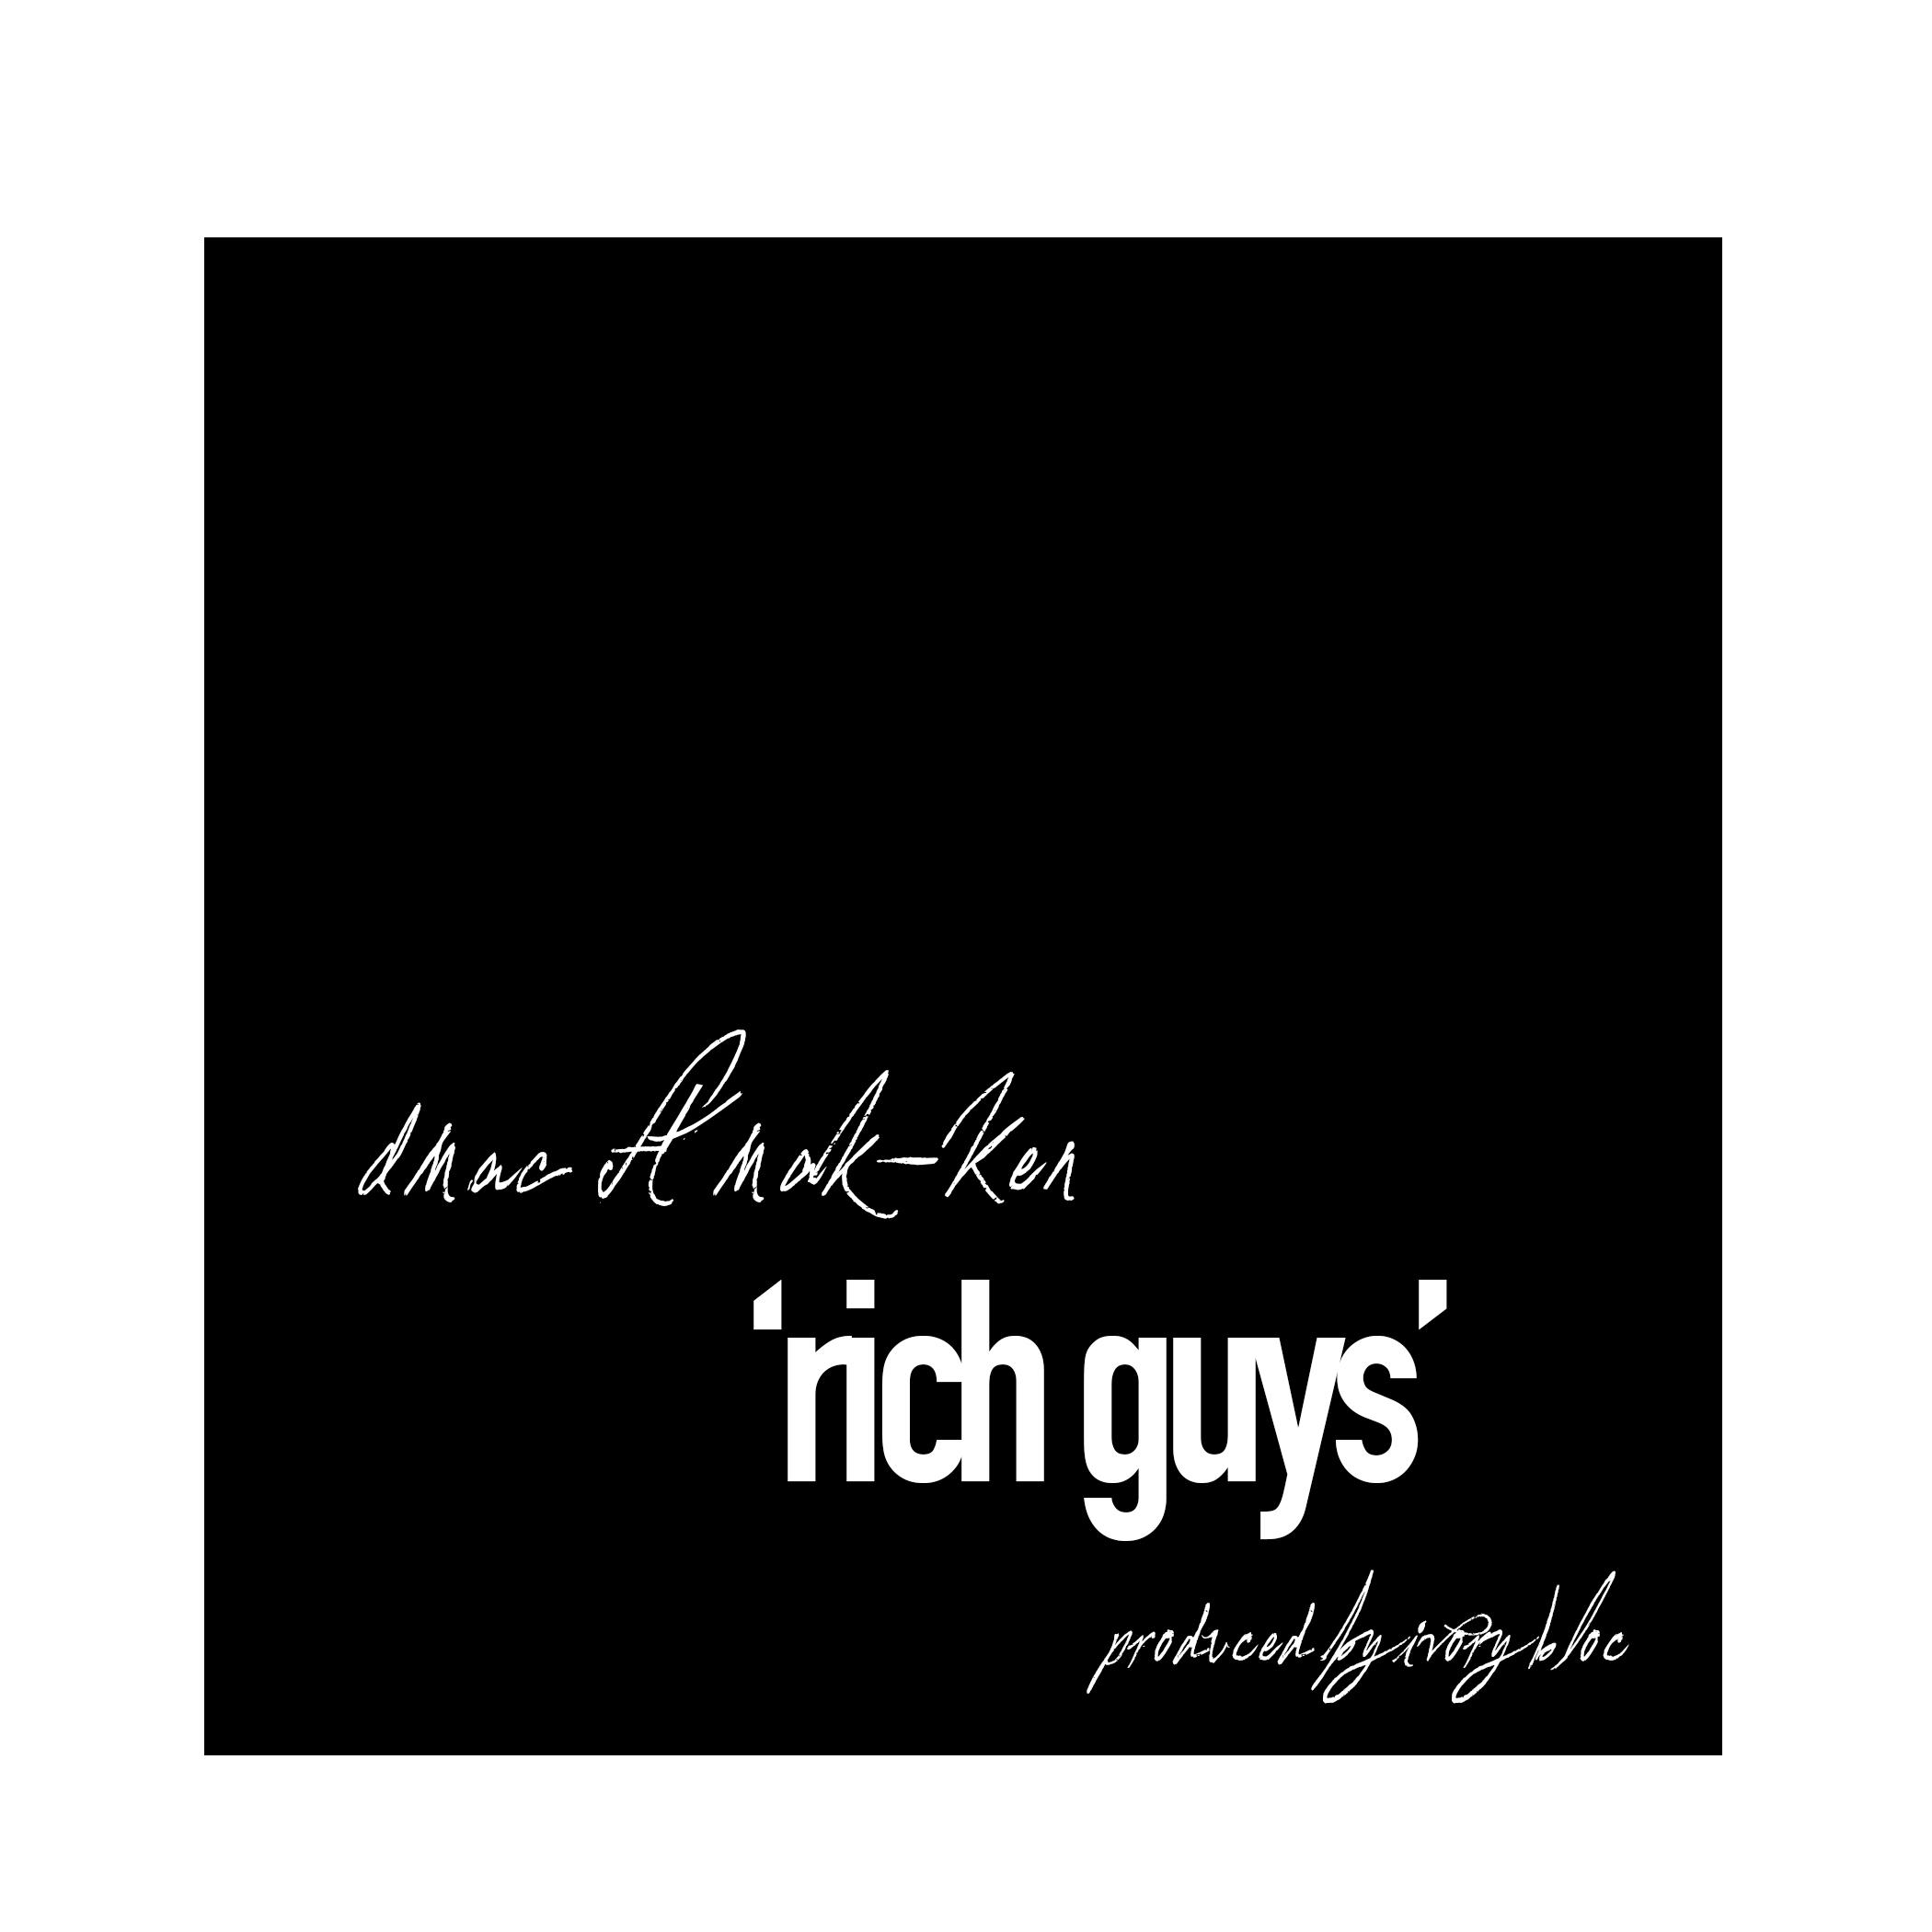 rich guys